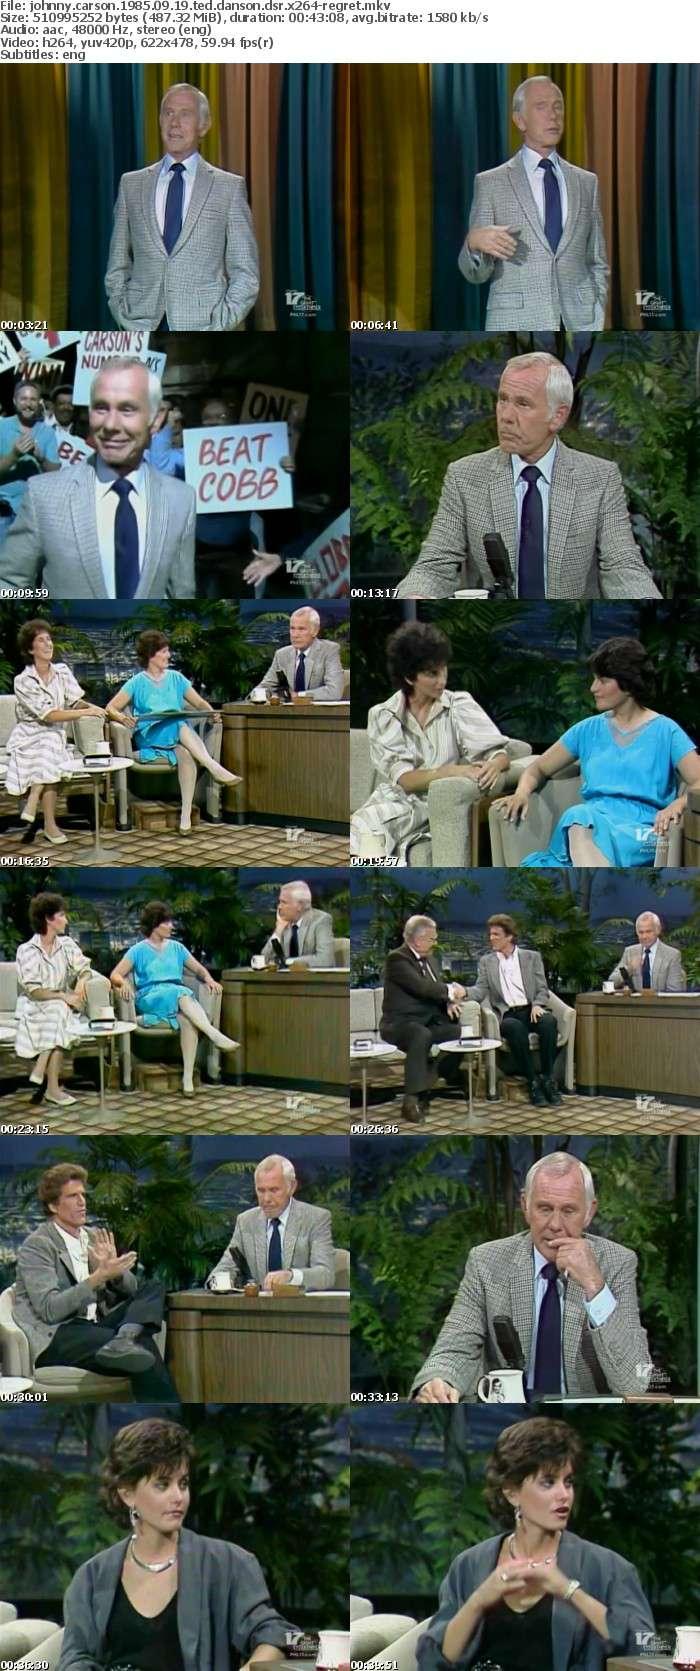 Johnny Carson 1985 09 19 Ted Danson DSR x264-REGRET